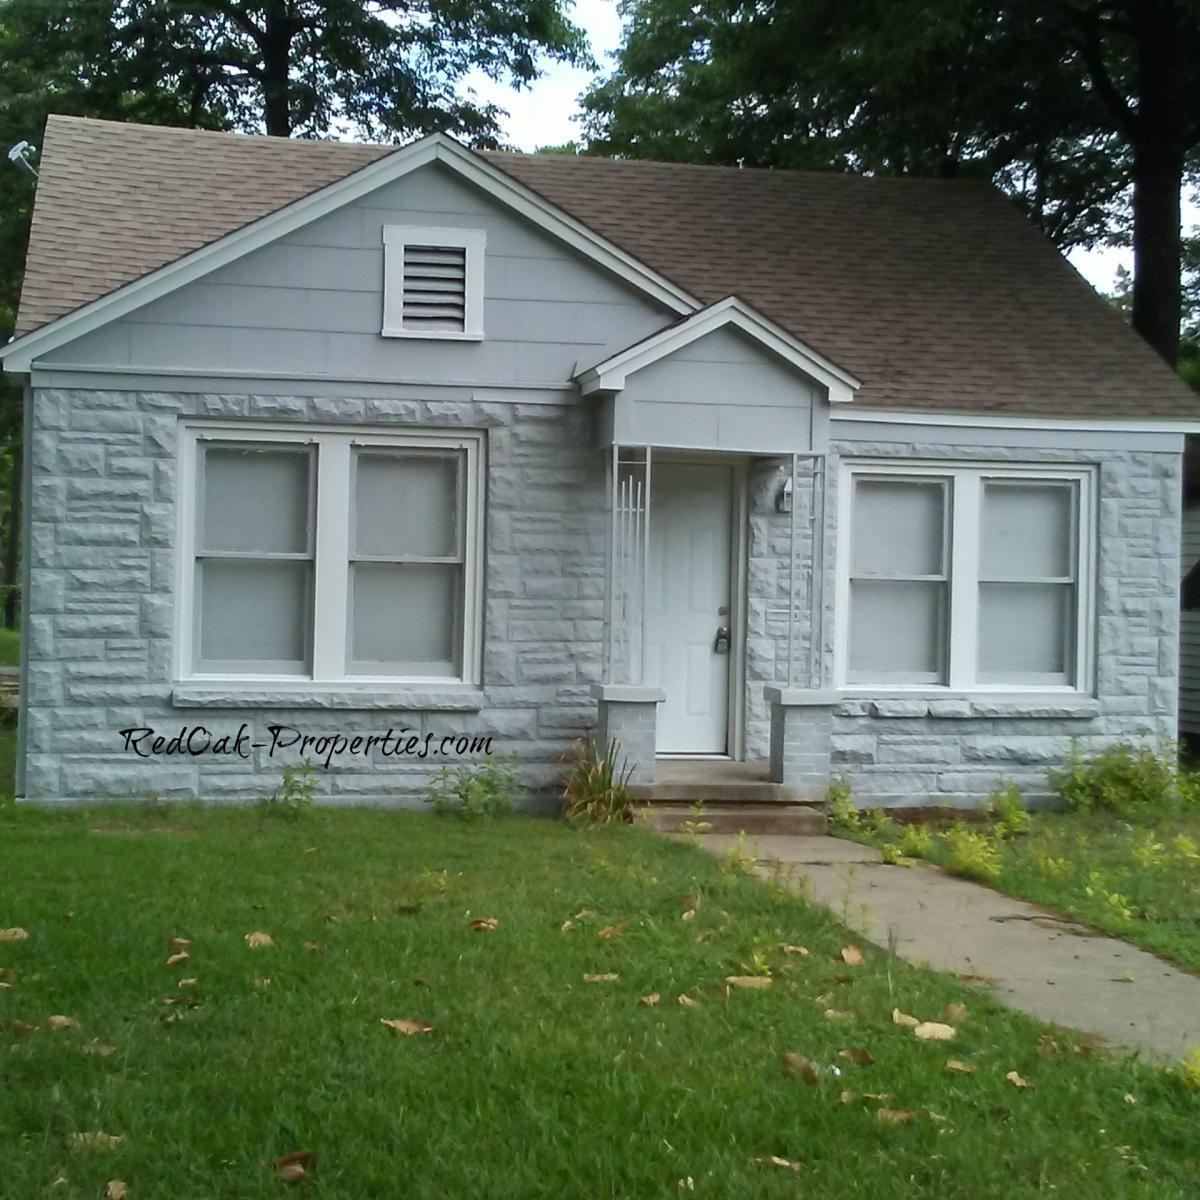 2125 Pine Ave Waco Tx 76708 2 Bed 1 Bath Single Family Home 6